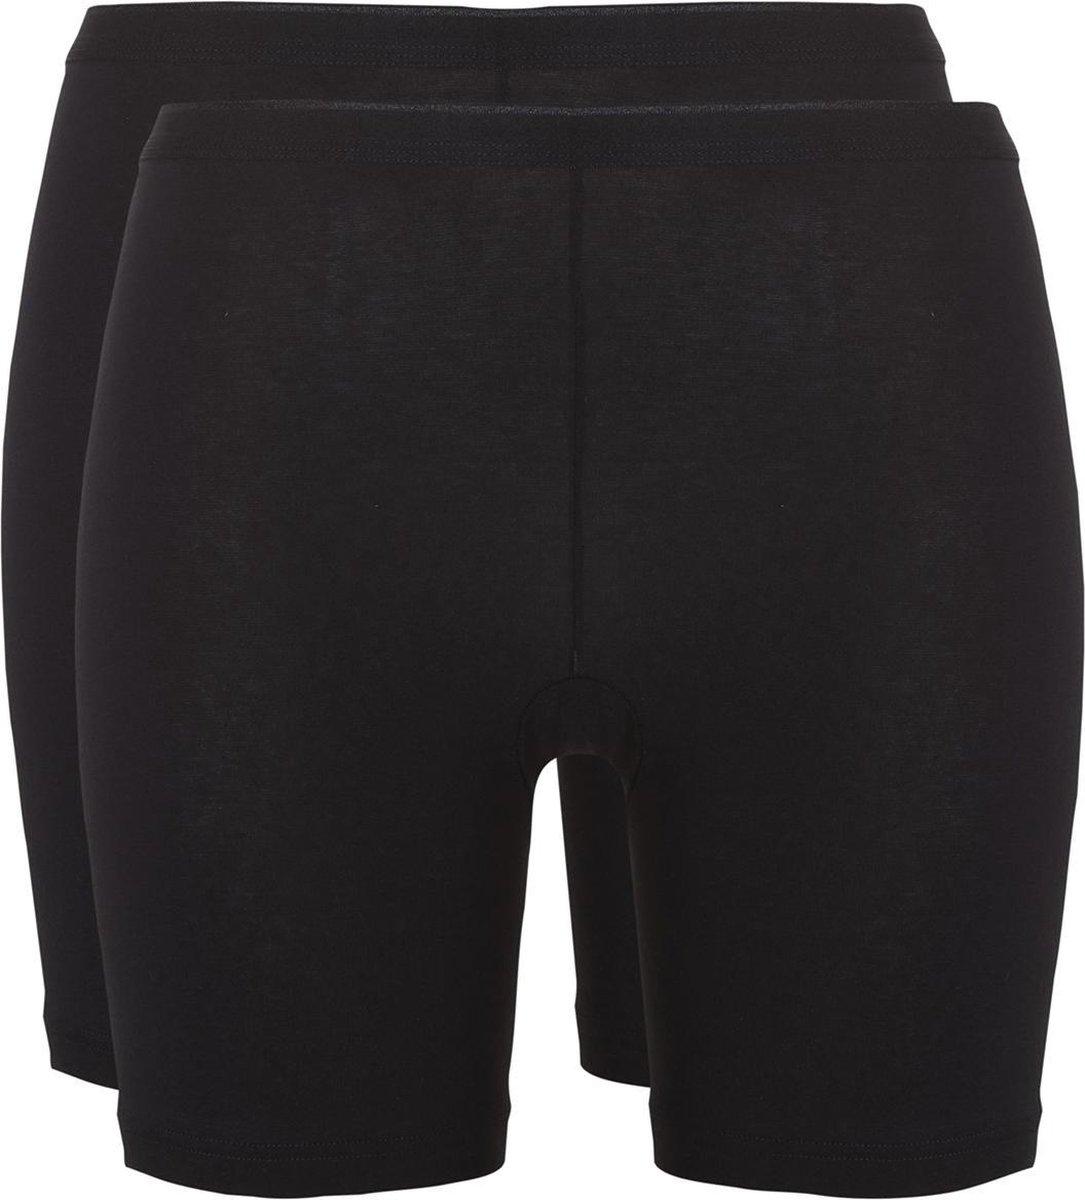 Ten Cate dames 2Pack Pants 30196 zwart-L - L